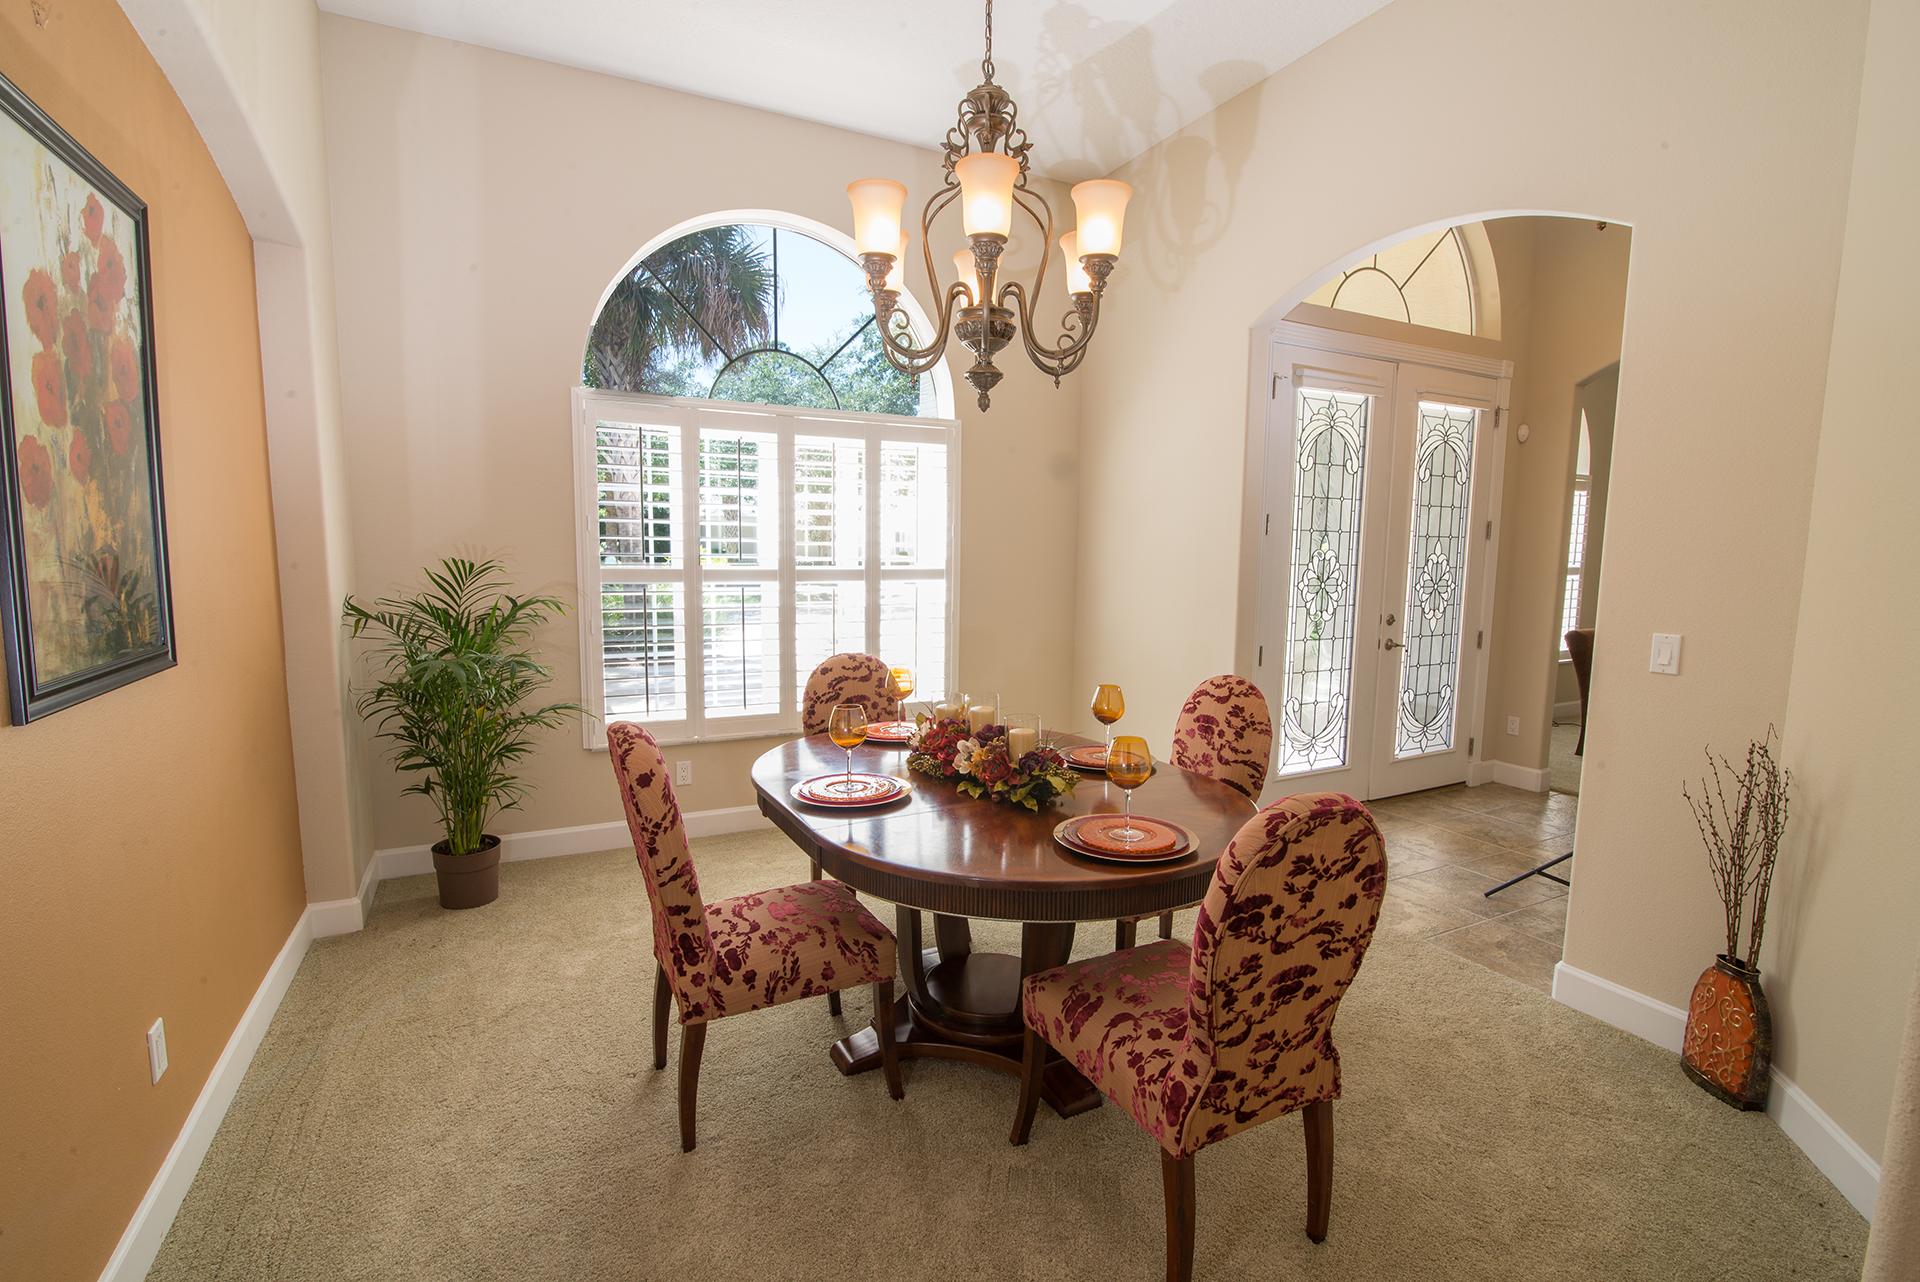 Staged-Assets-Home-Staging-Interior-Design-Palm-Coast-Florida-19